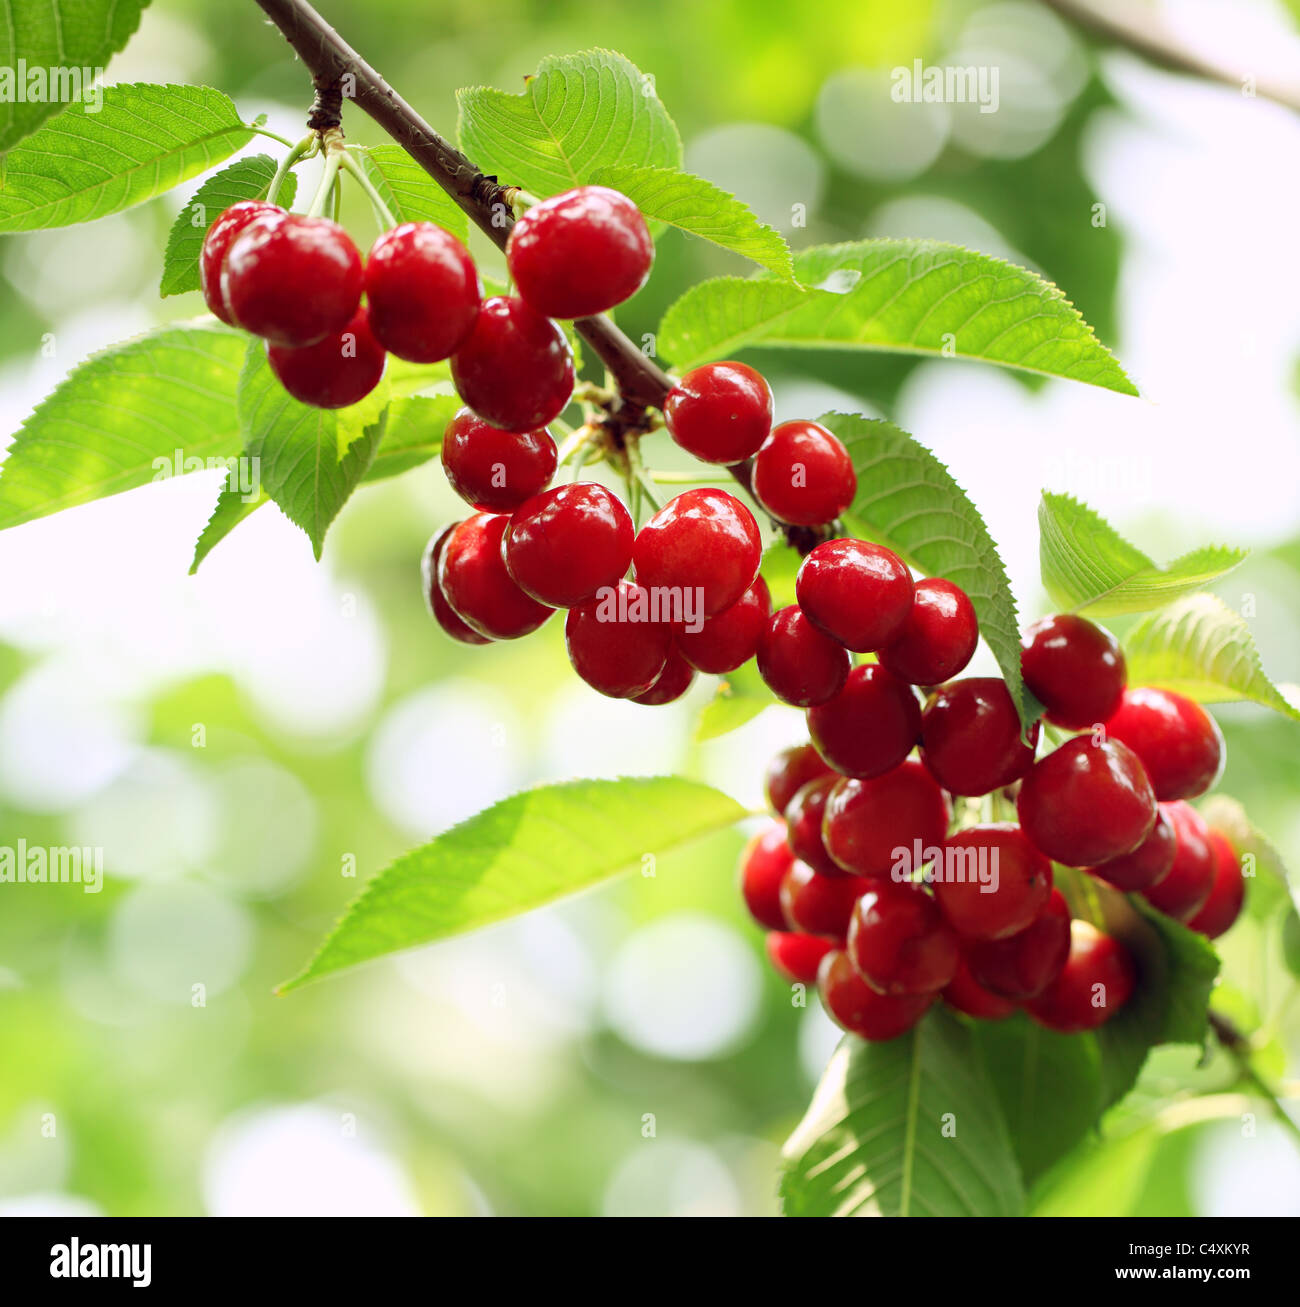 Cherry tree with ripe cherries in the garden. - Stock Image